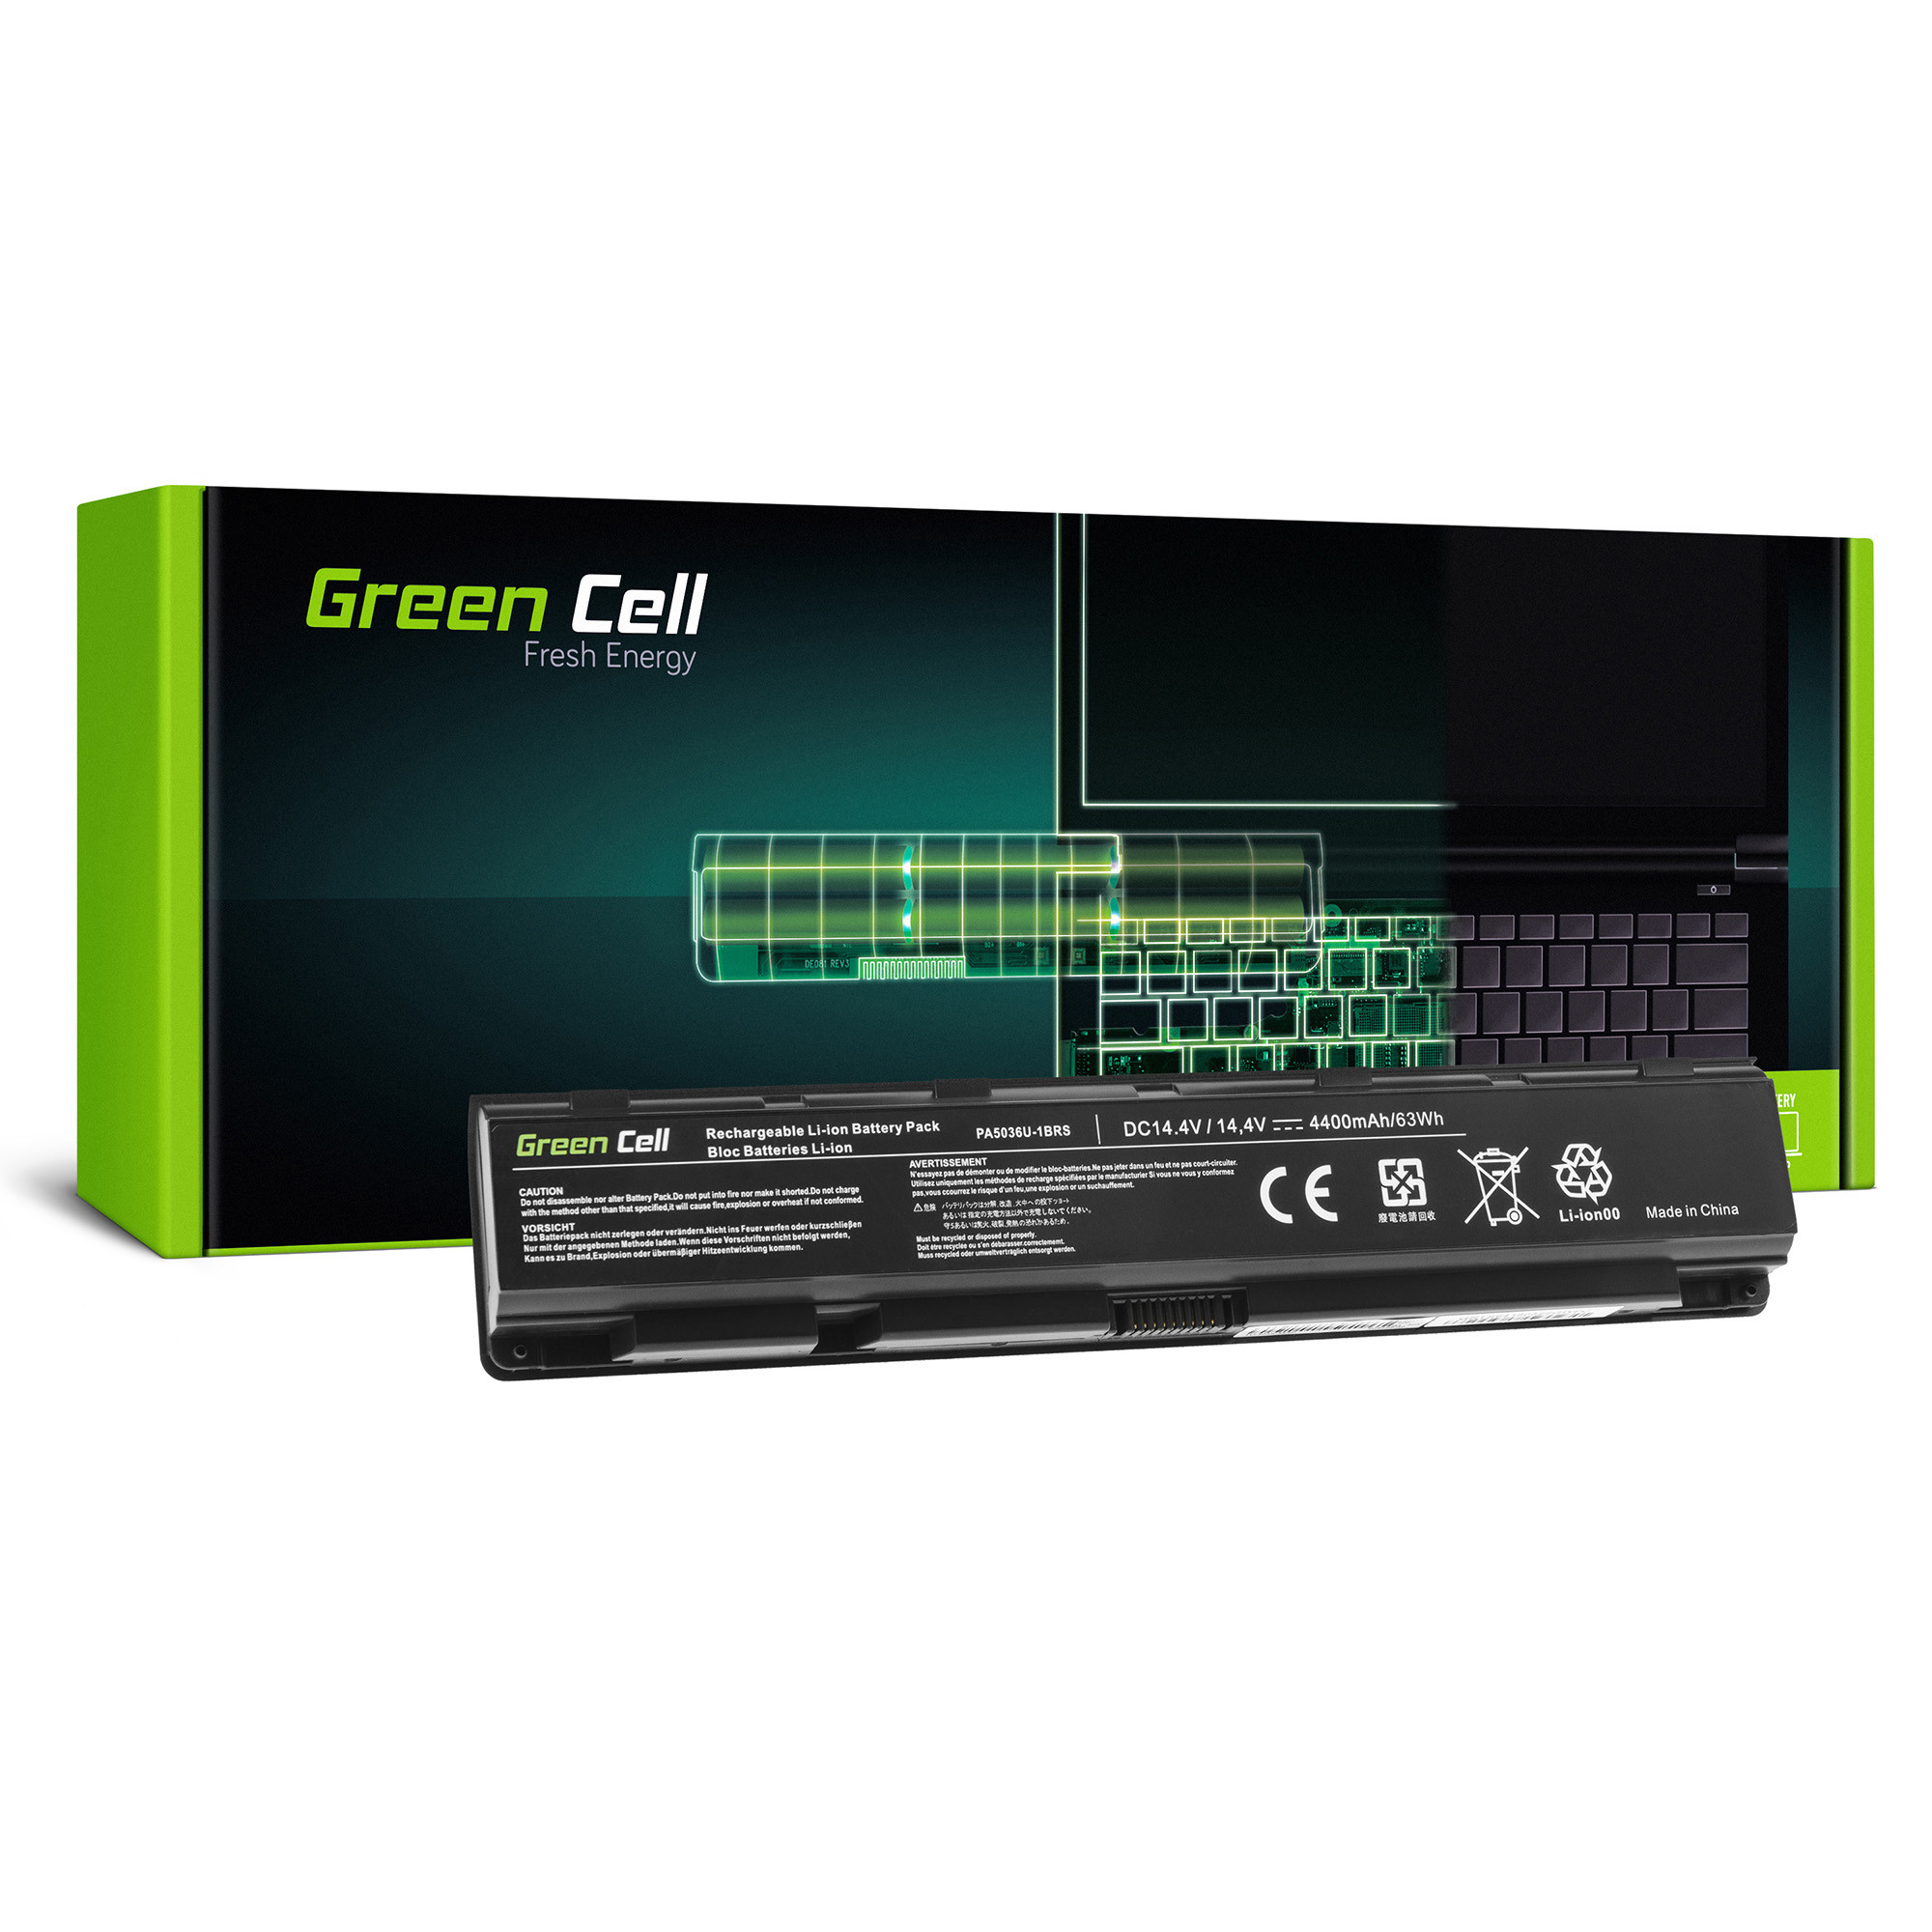 Green Cell TS64 Baterie Toshiba PA5036U-1BRS PABAS264 Toshiba Qosmio X70 X70-A X75 X870 X875 4400mAh Li-ion - neoriginální